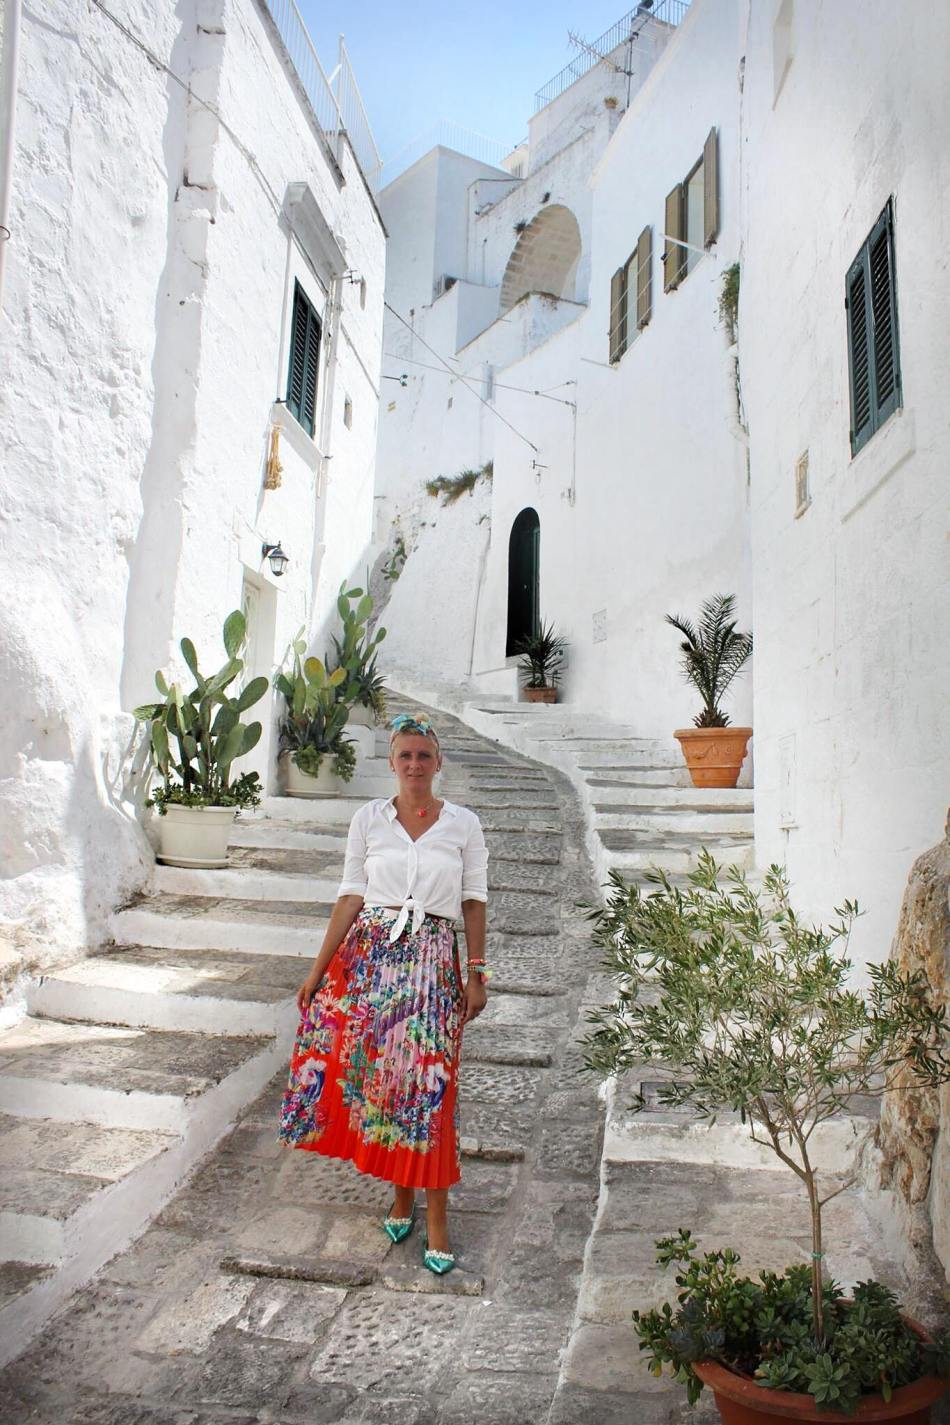 Ostuni-Bianca-weiß-Kalk-Apulien-Puglia-Italy-Italien-Reiseblog-Reisebericht-carrieslifestyle-Tamara-Prutsch